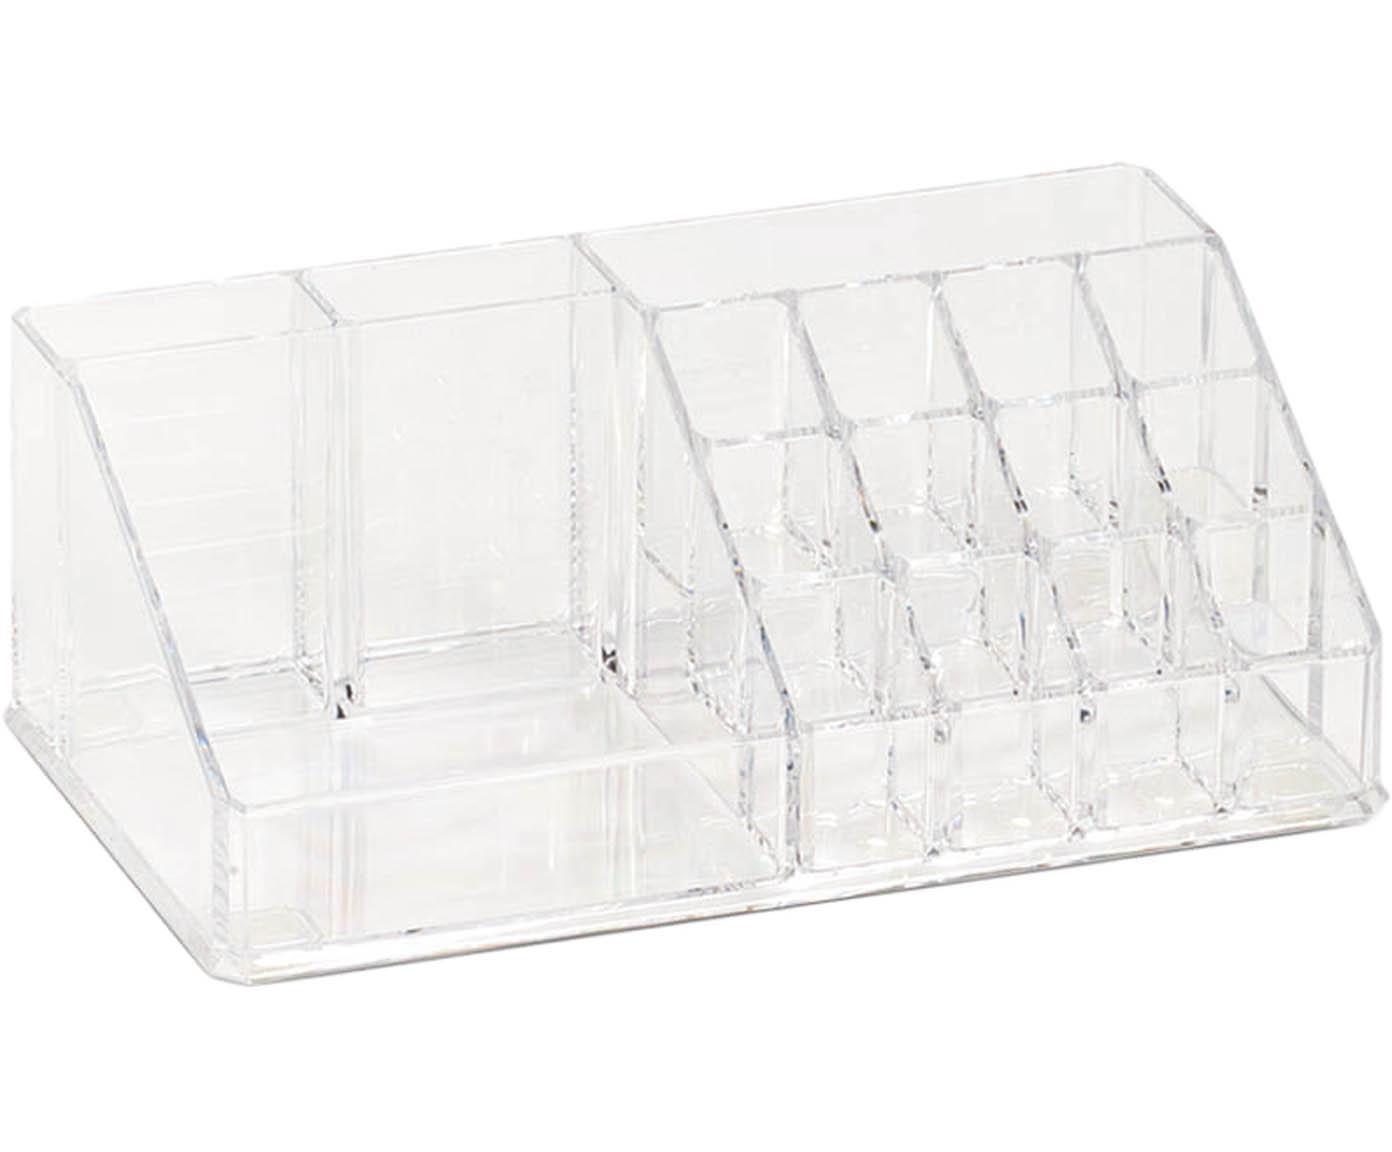 Porta trucchi Clear, Materiale sintetico, Trasparente, Larg. 22 x Alt. 8 cm